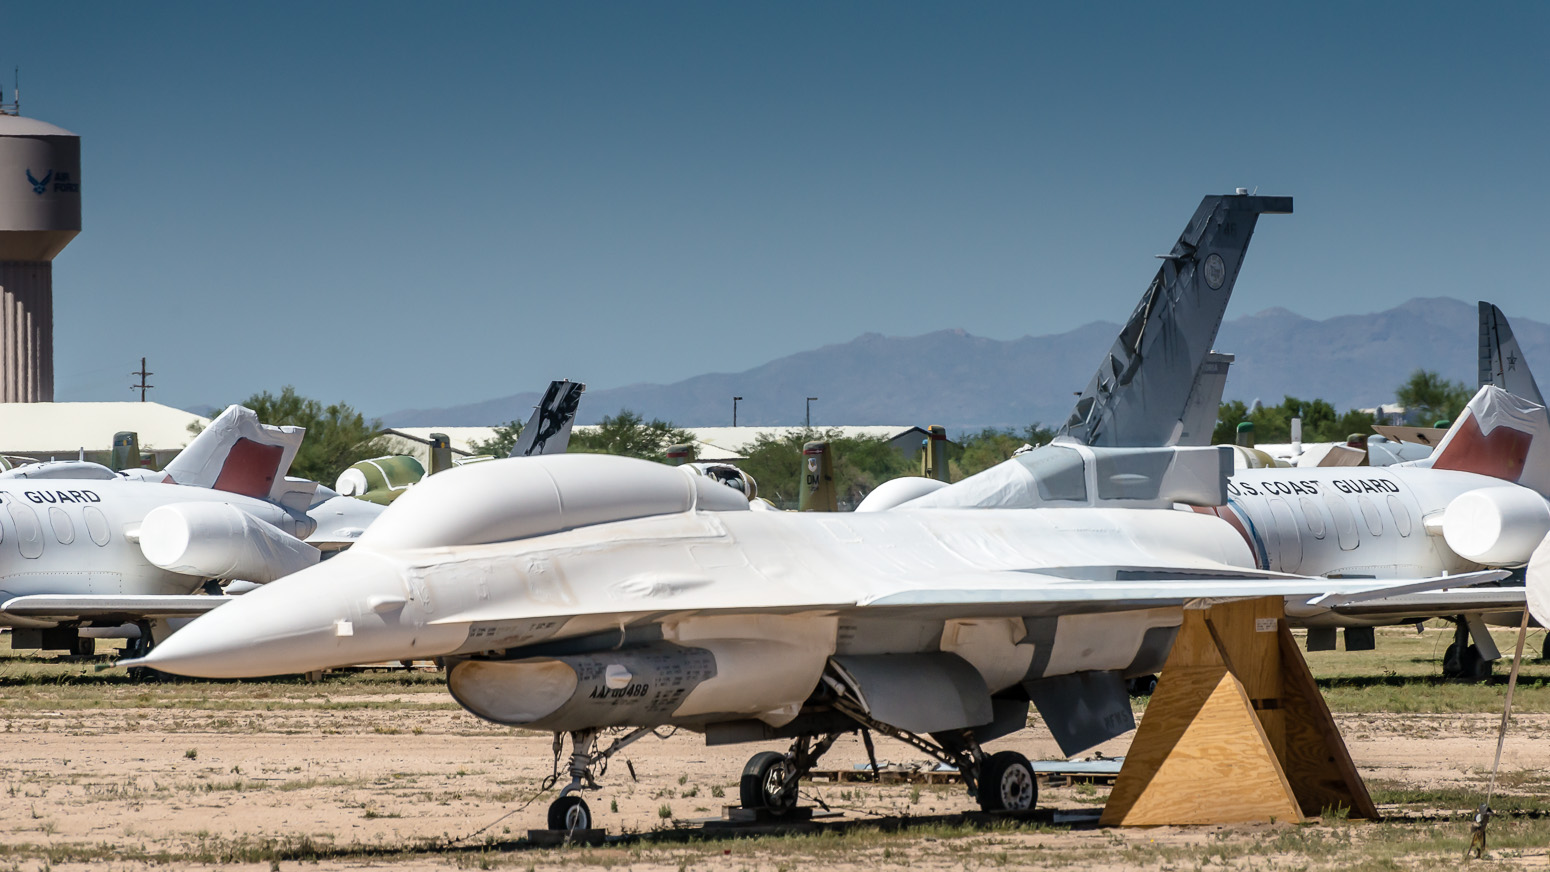 F-16, The Boneyard, Davis-Monthan Air Force Base, Tucson, USA